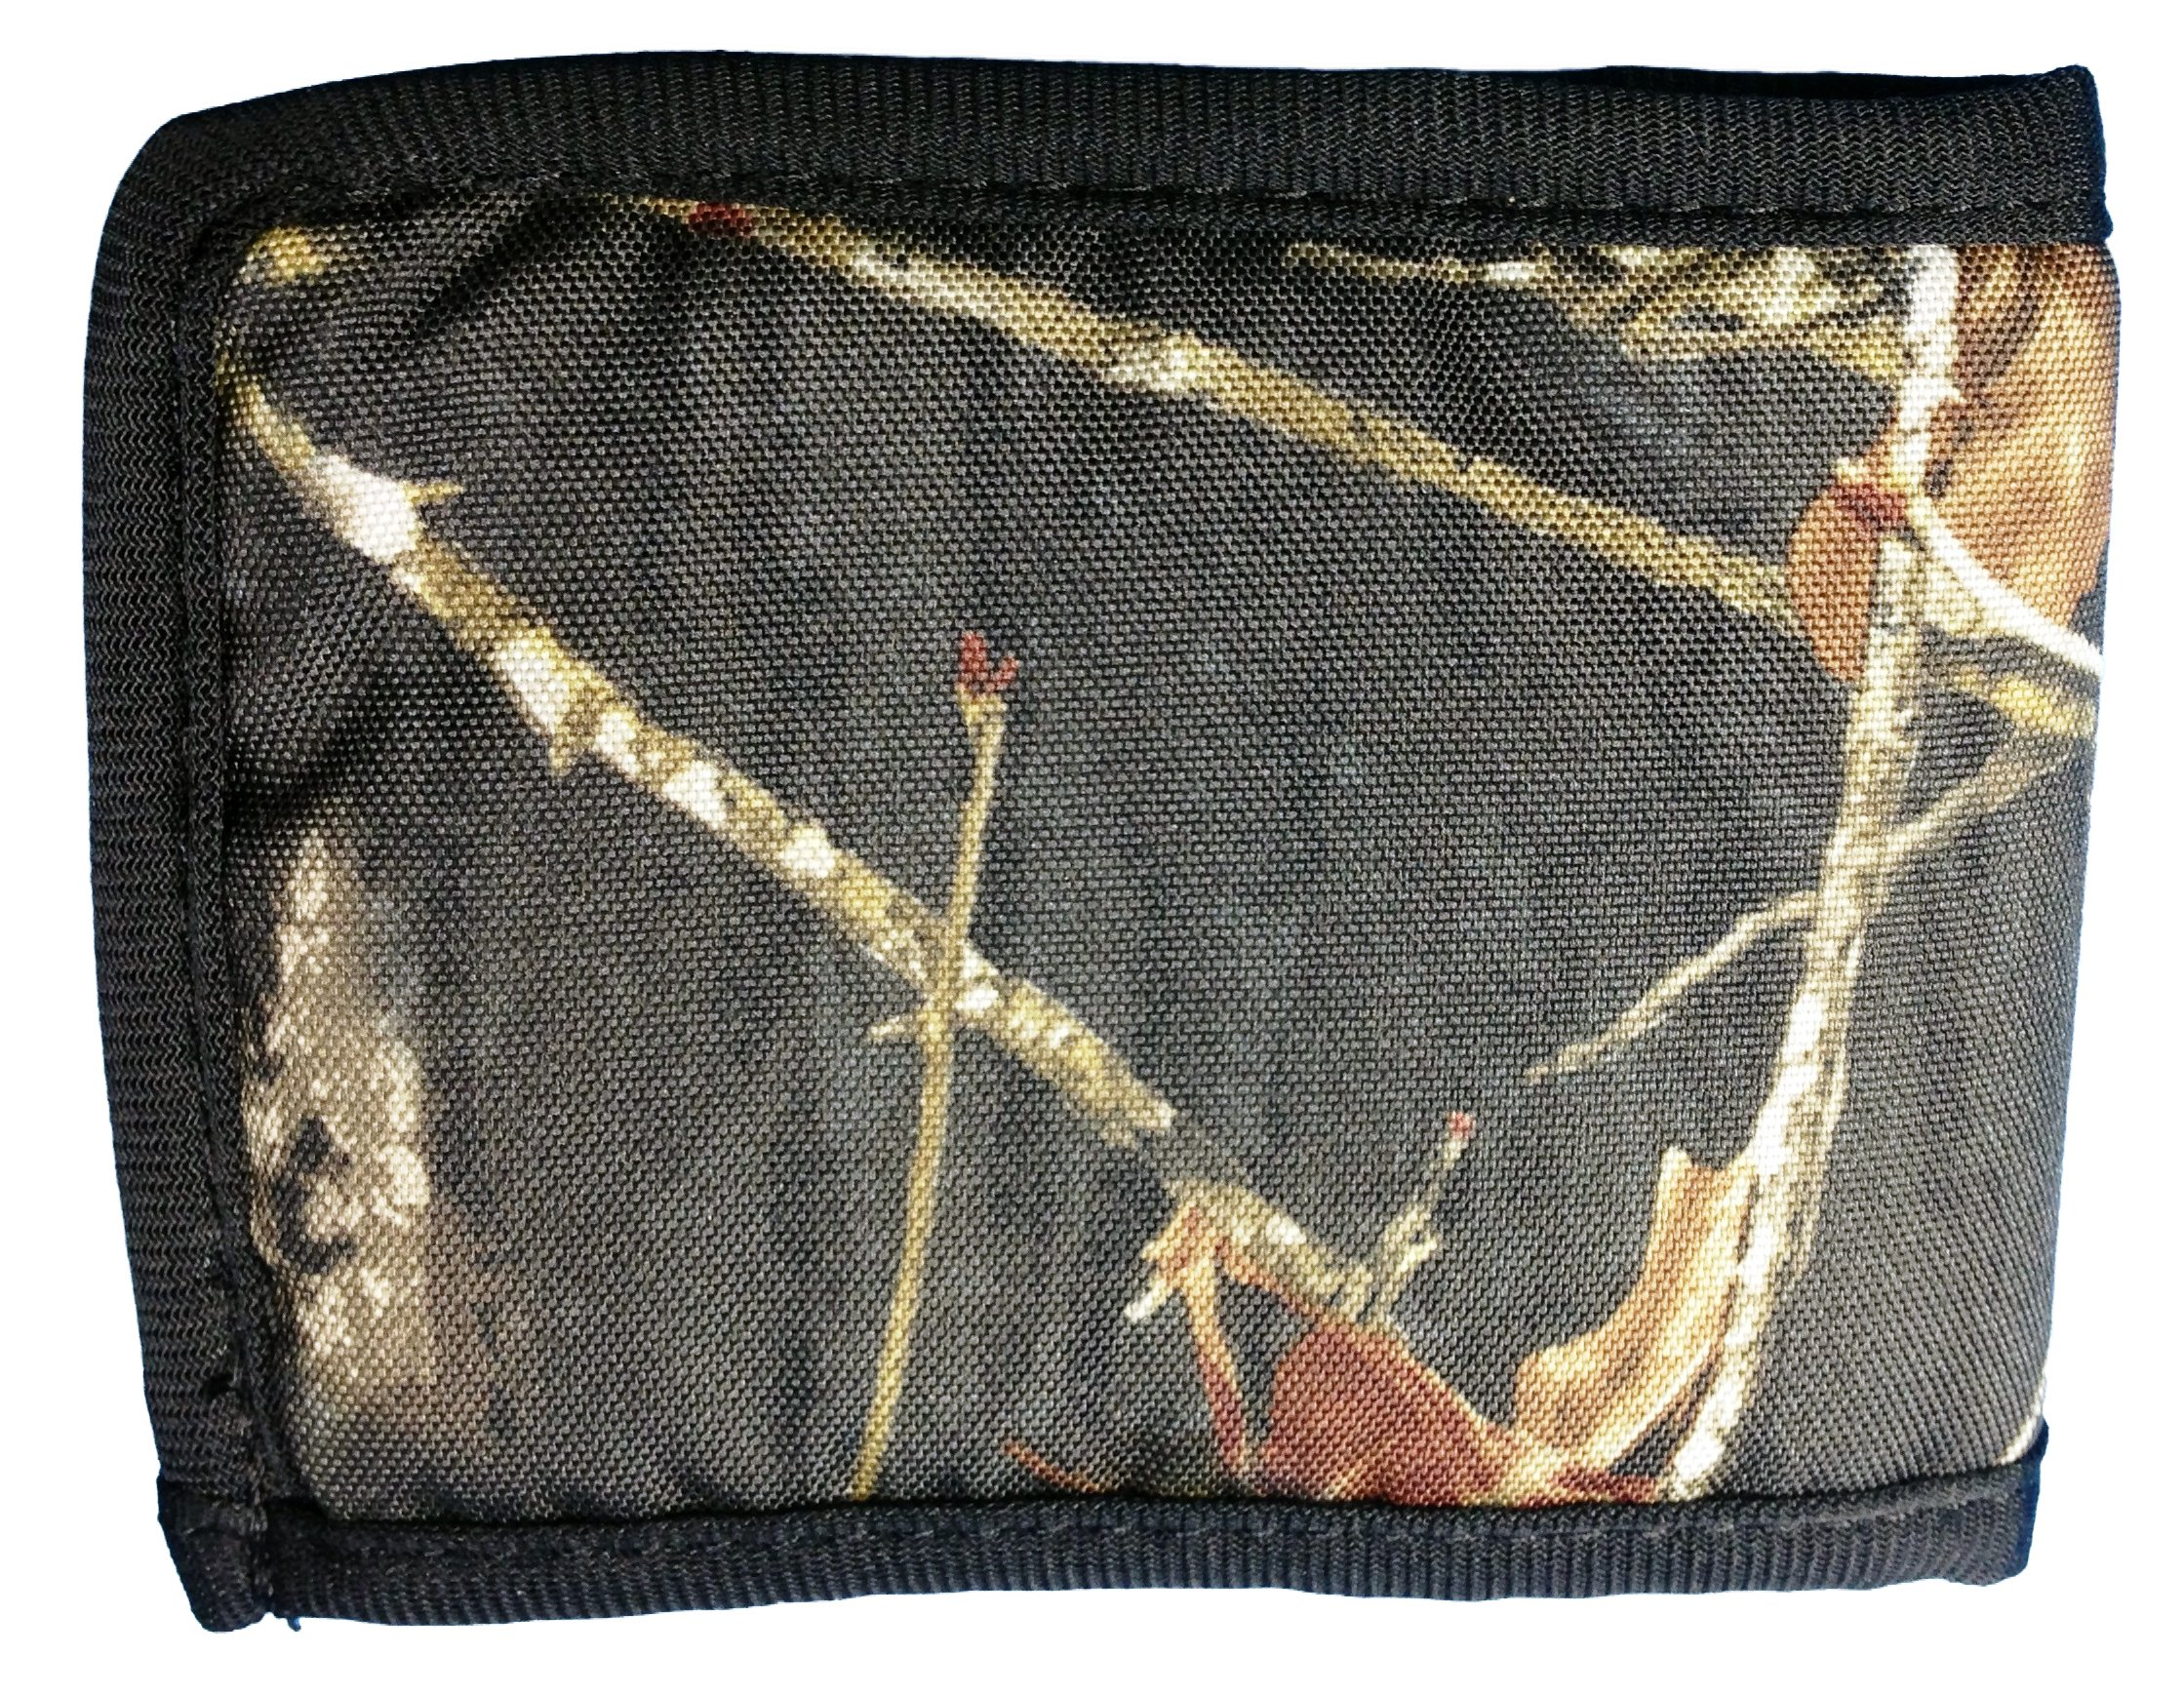 Mens Mossy Oak Camo Bi Fold Wallet Camo Bill Fold for Men Plus a FREE Decal